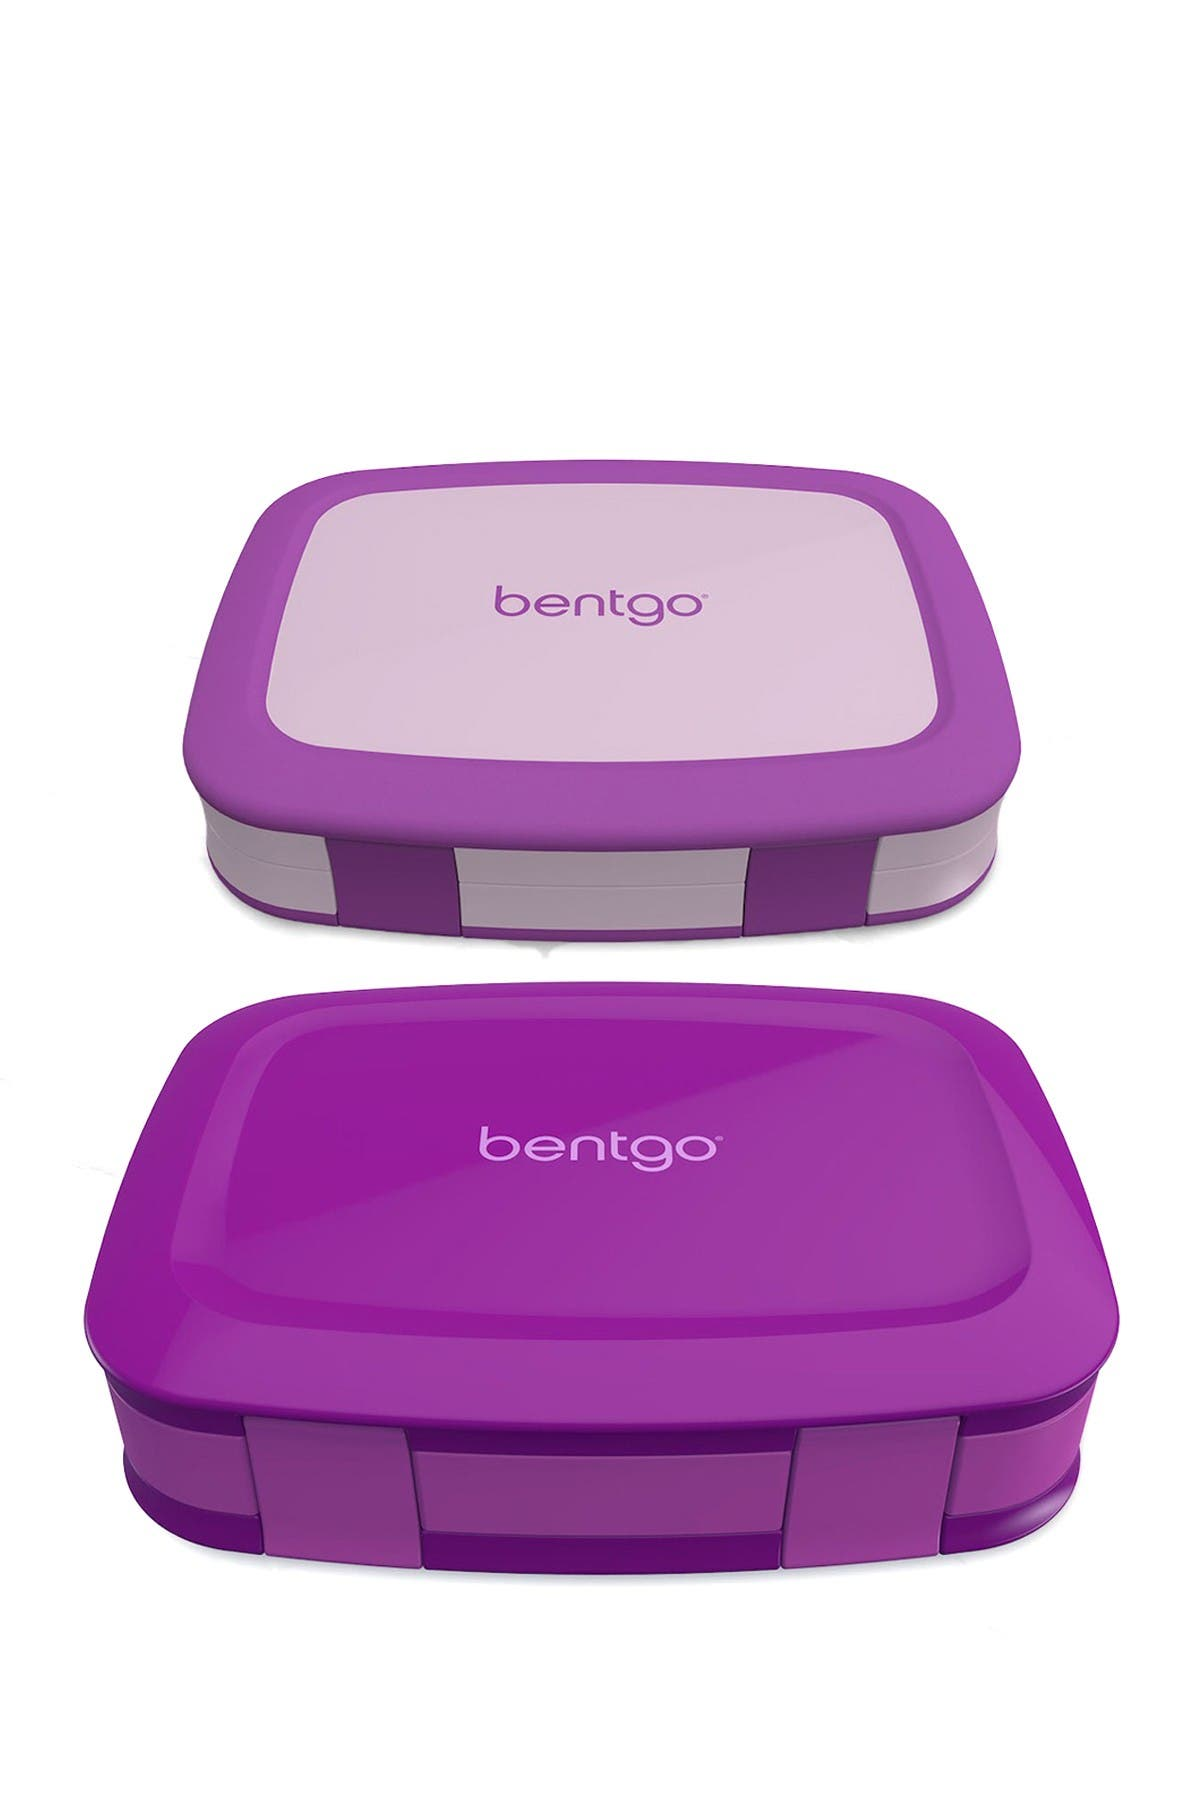 Image of BENTGO 2-Pack Fresh and Kids - Purple